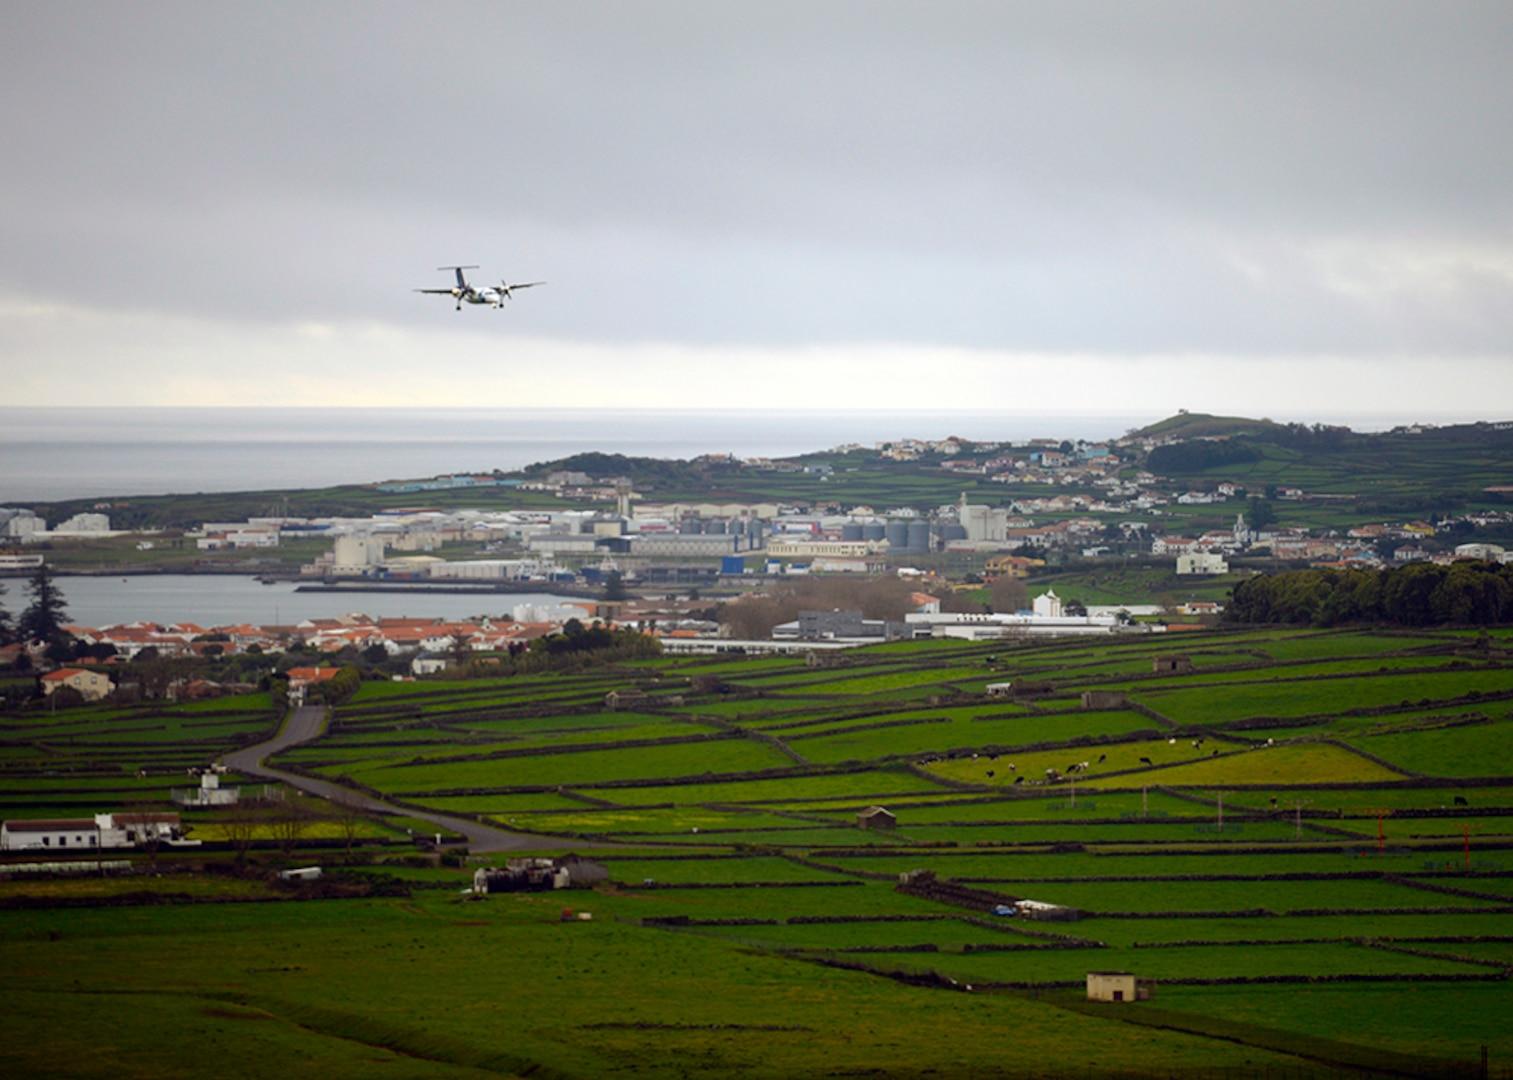 A plane lands in an oceanside village.